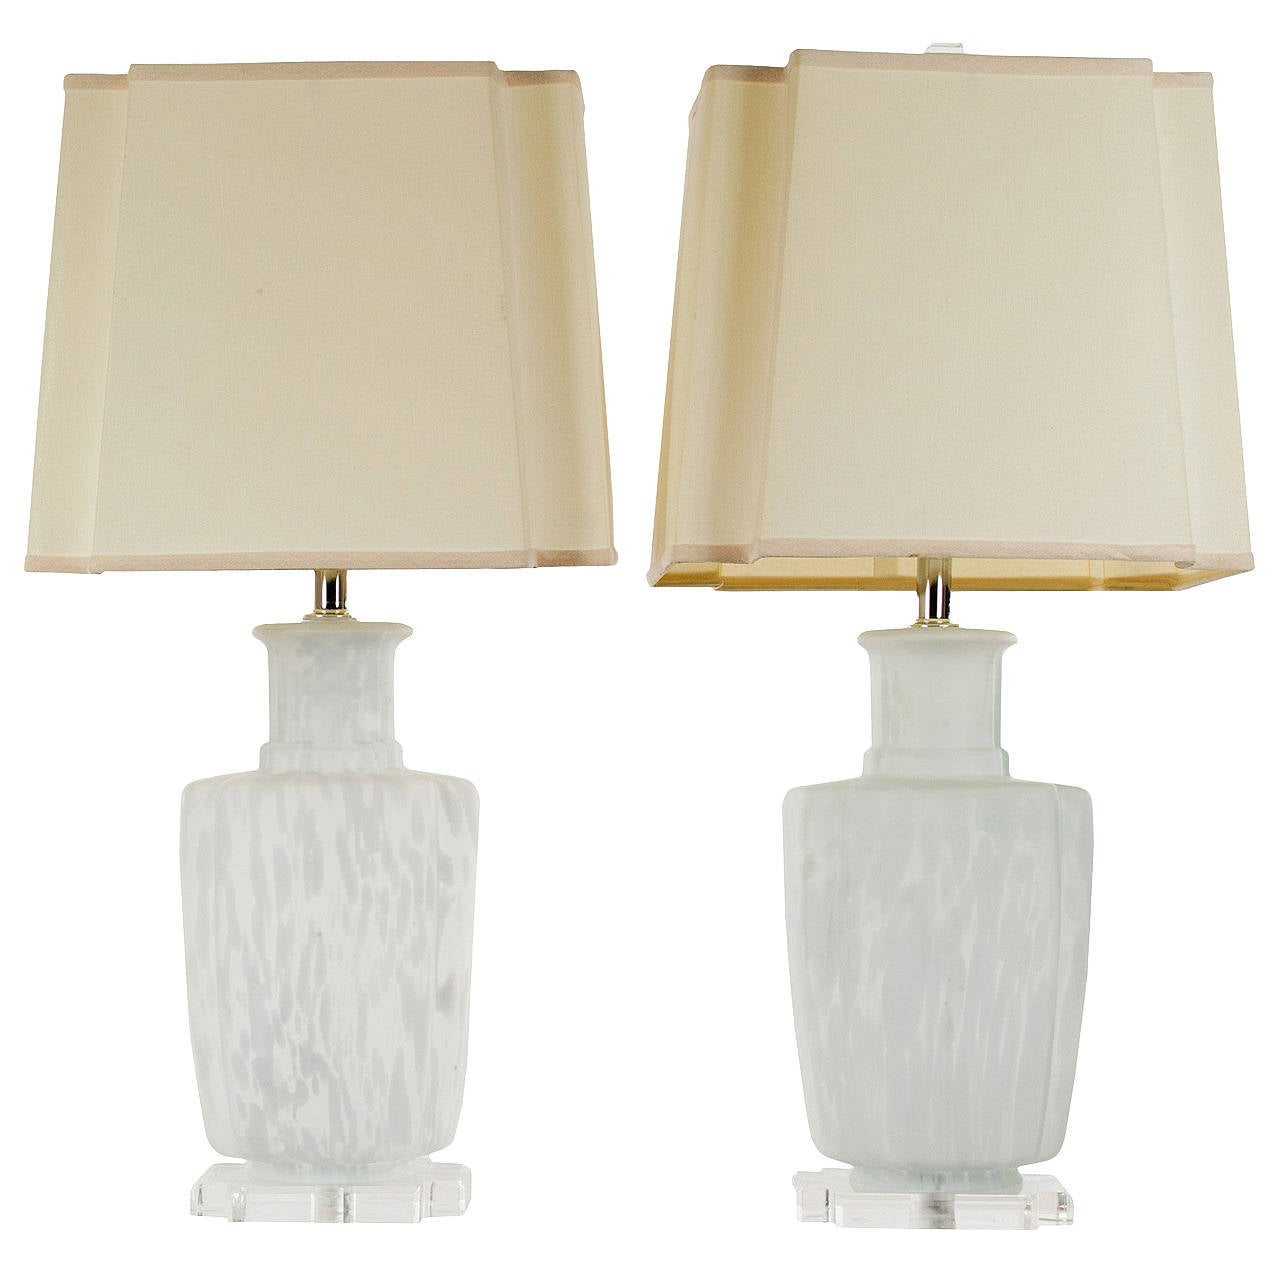 Salt Lamp Bulbs Blowing : Pair of Italian Blown Glass Table Lamps at 1stdibs